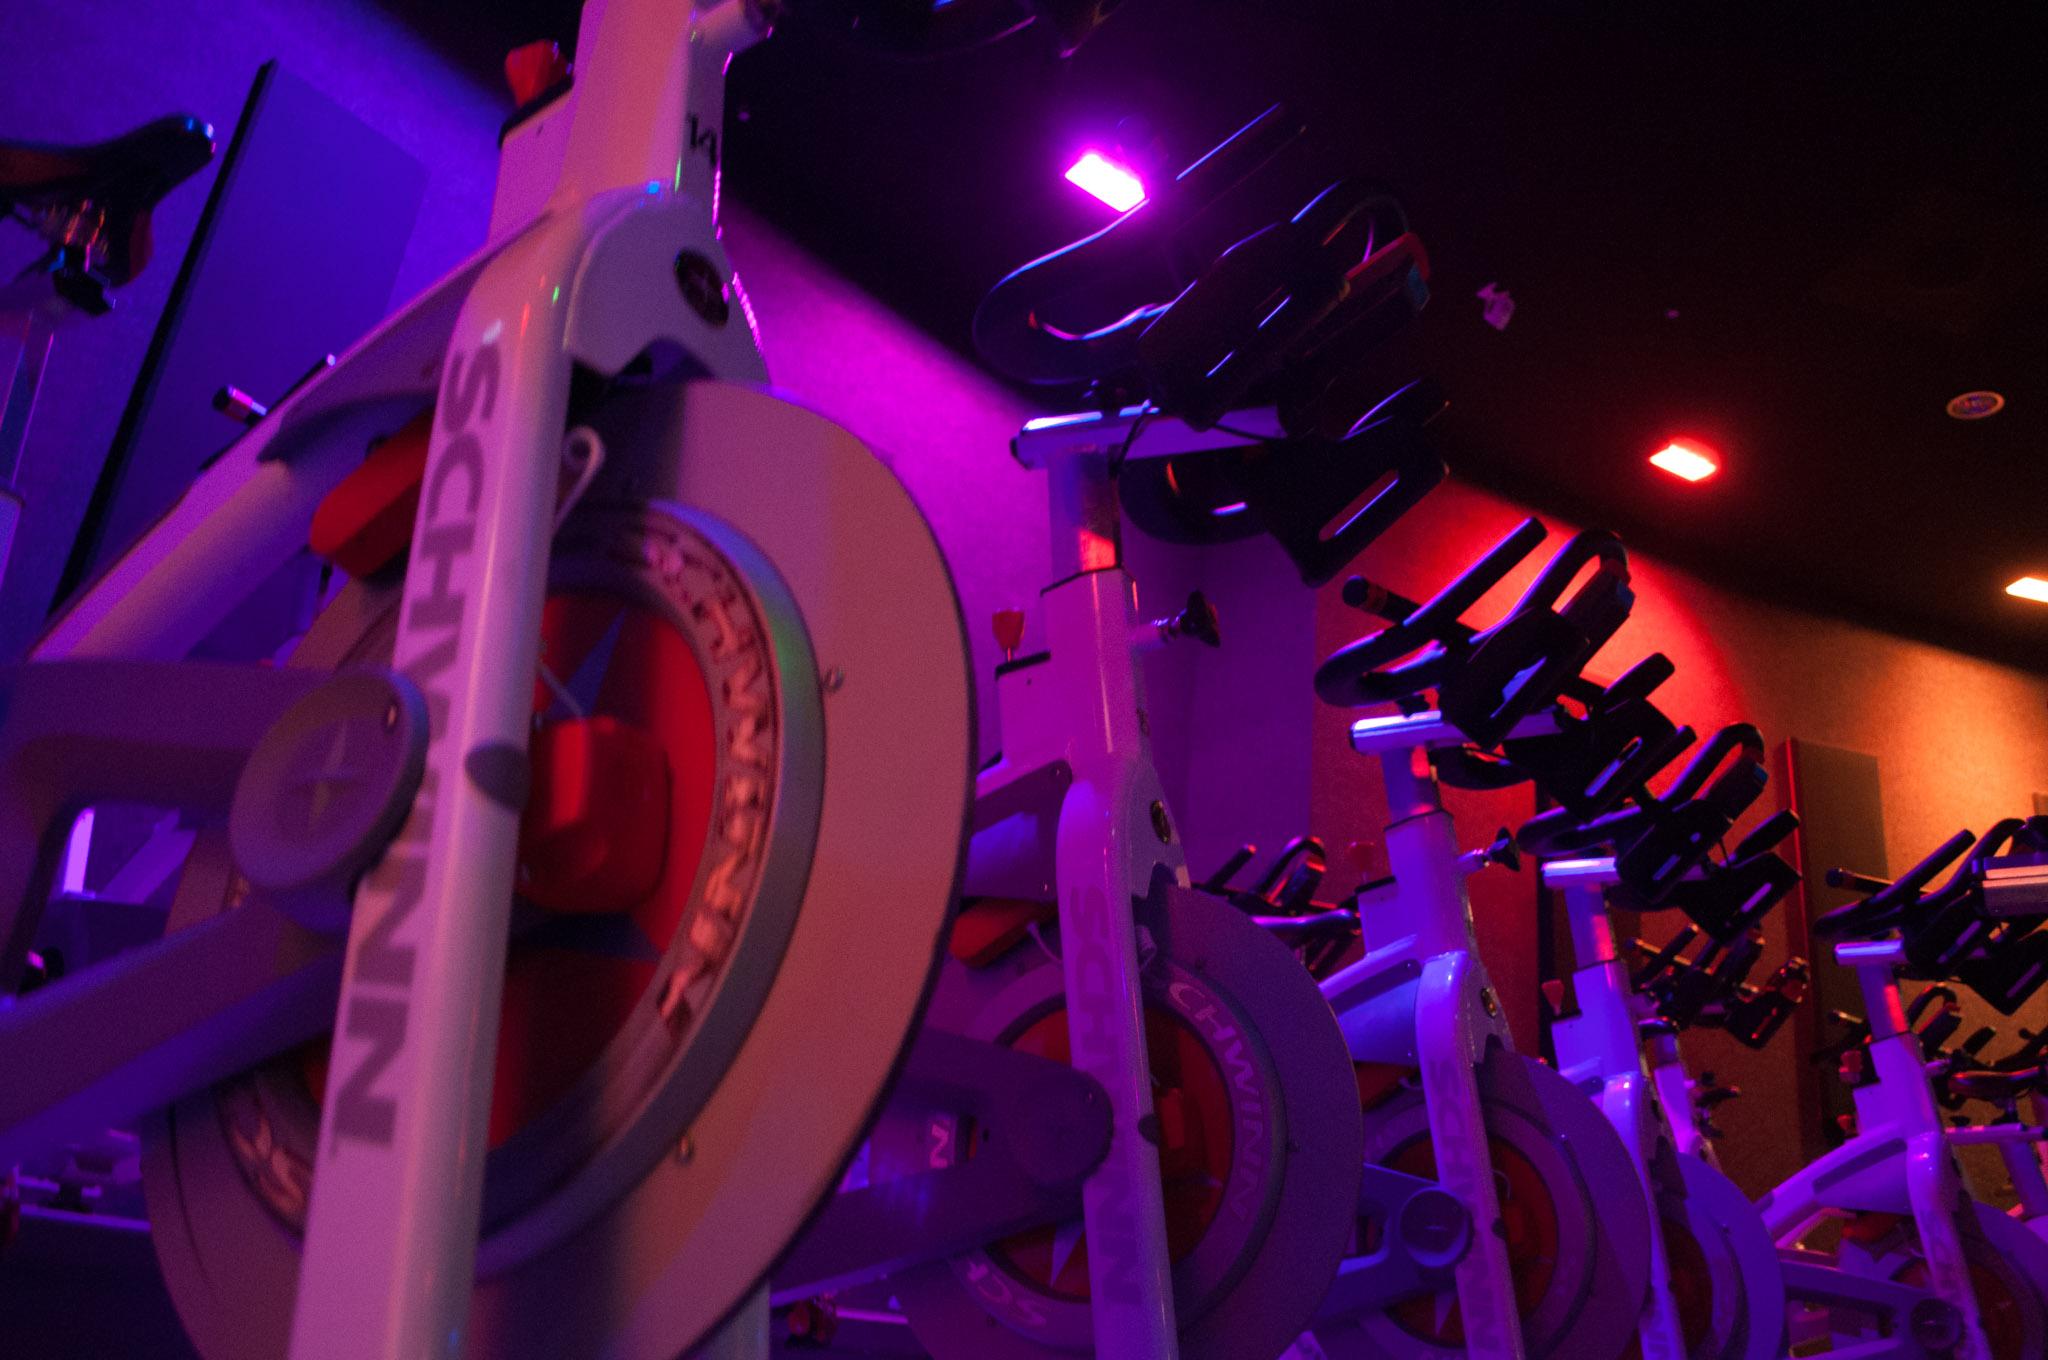 photo courtesy of cyclebar.com